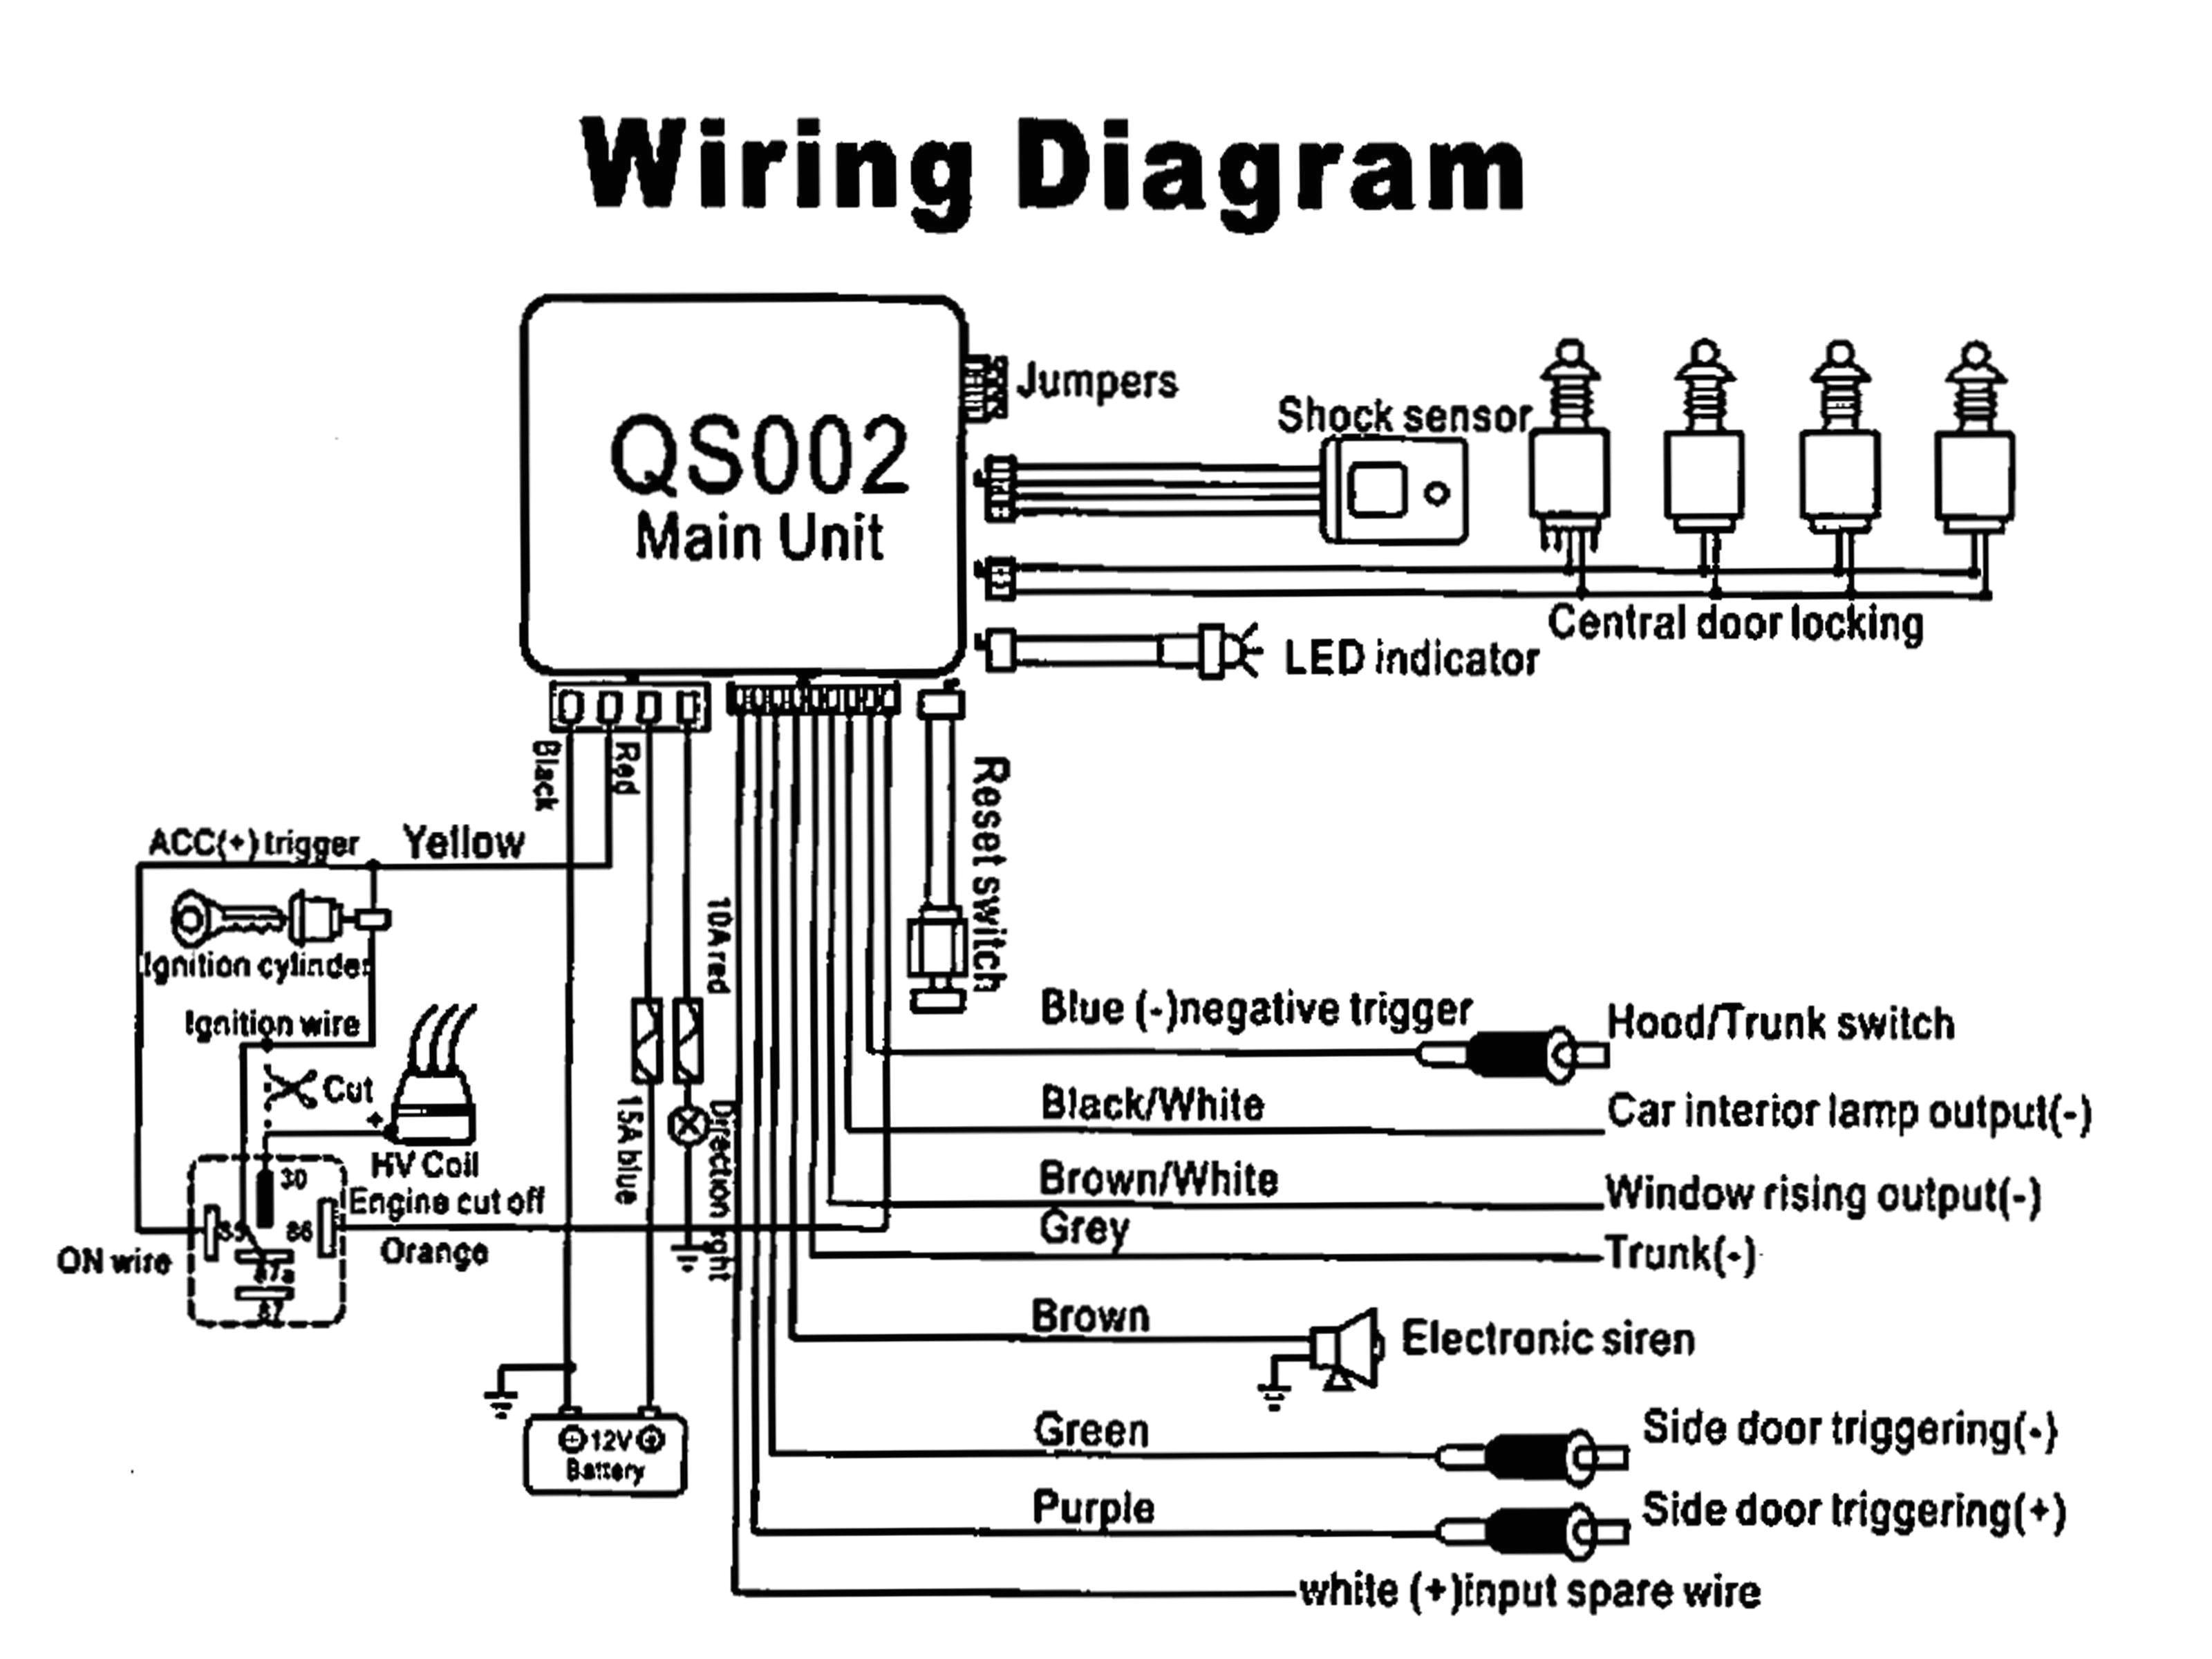 alarm wire diagram wiring diagram name wiring diagram for alarm car alarm wiring guide wiring diagram